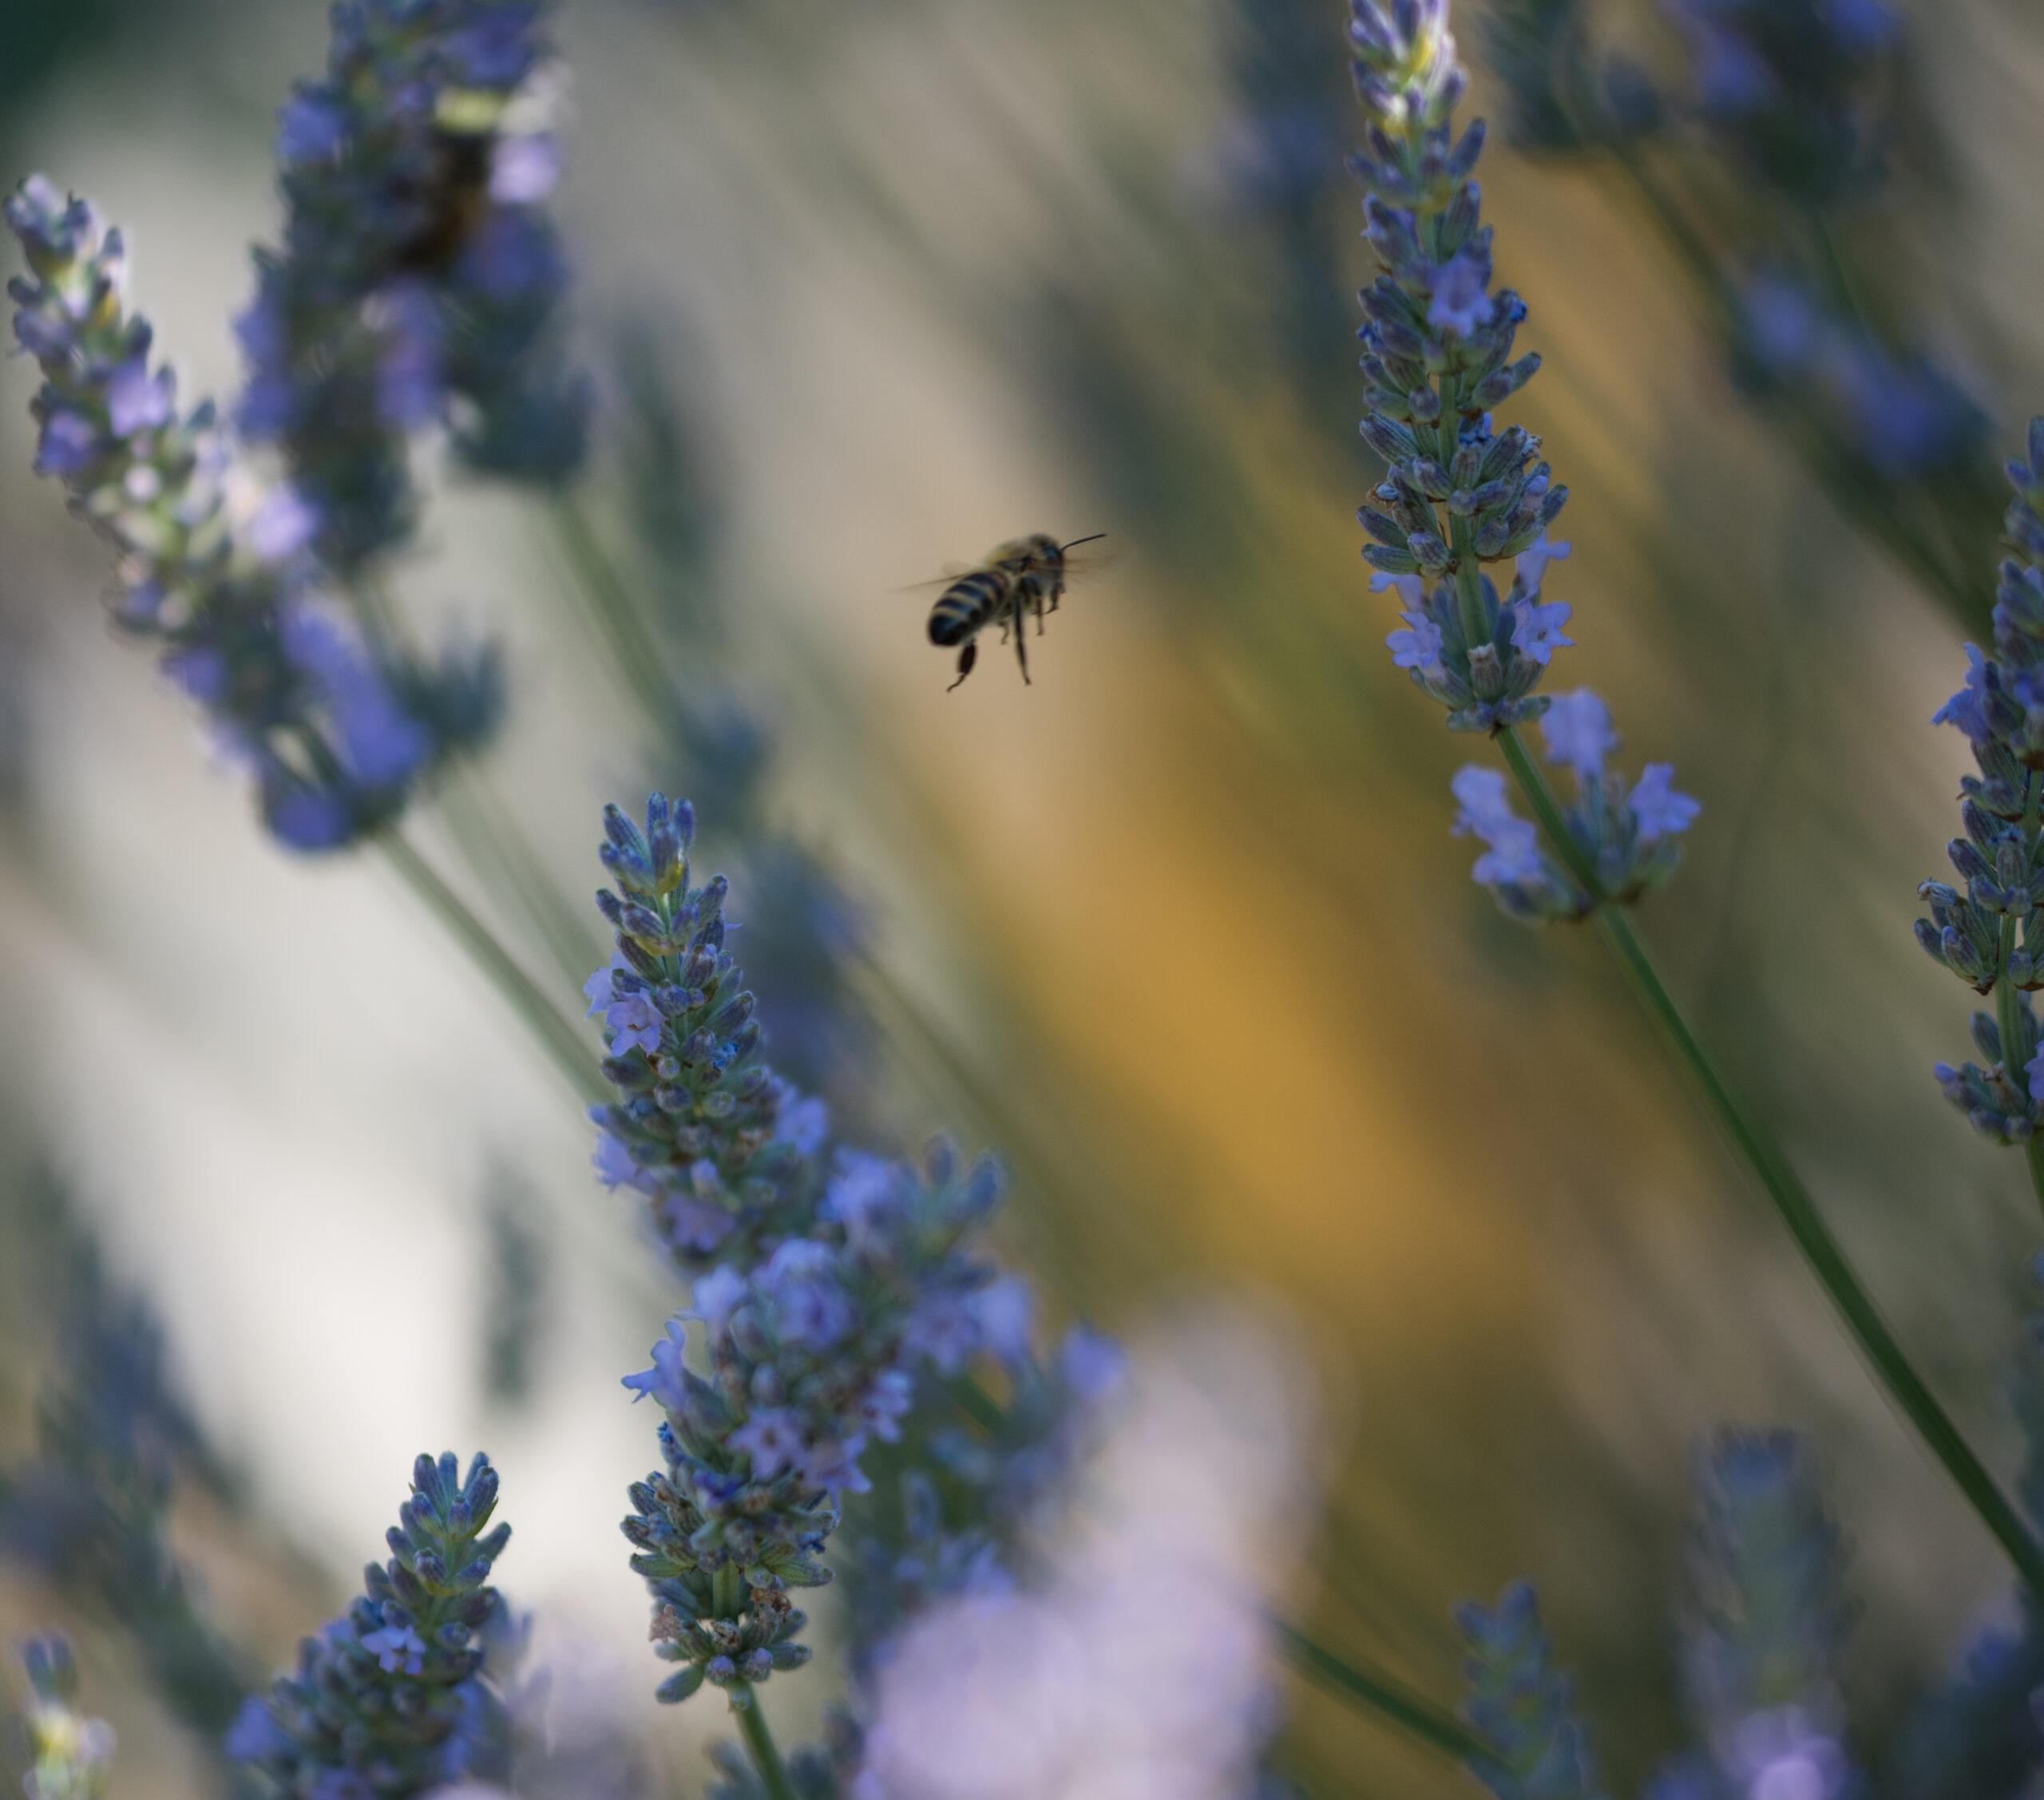 Biene, Blume, Lila, Gelb